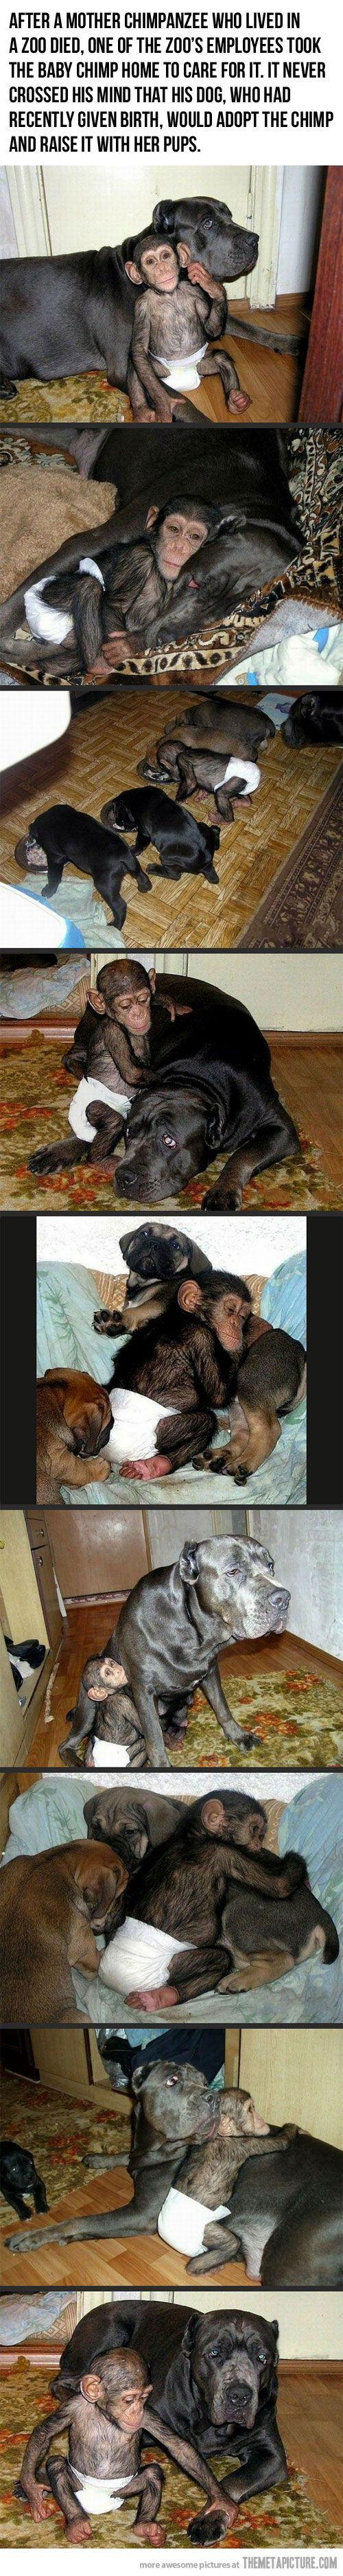 Dog Adopts Baby Chimpanzee